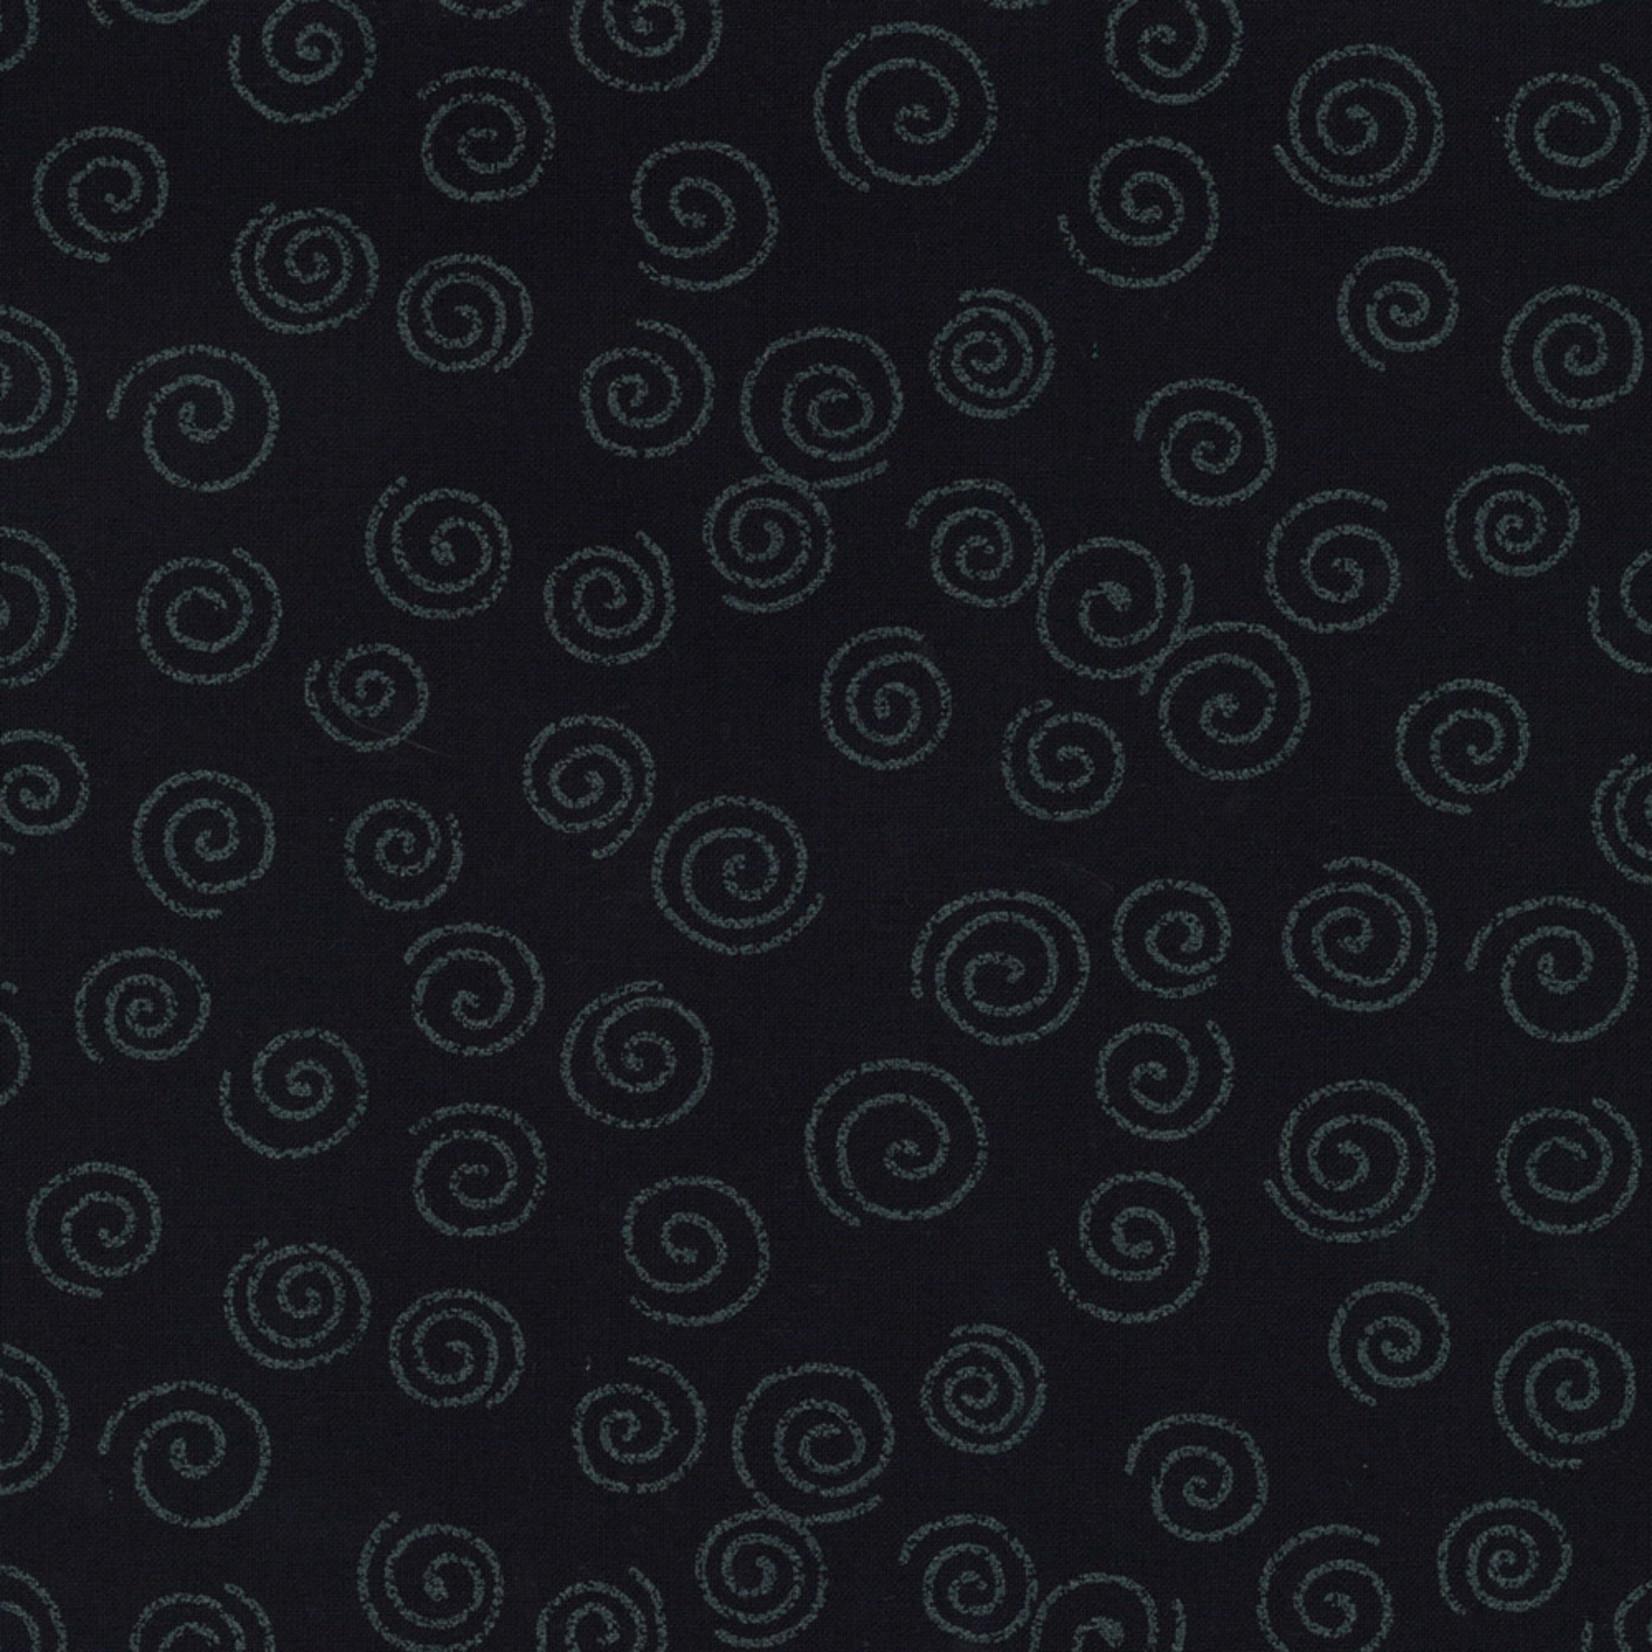 Stof Fabrics Japanese Blue - Swirls - Deep Blue